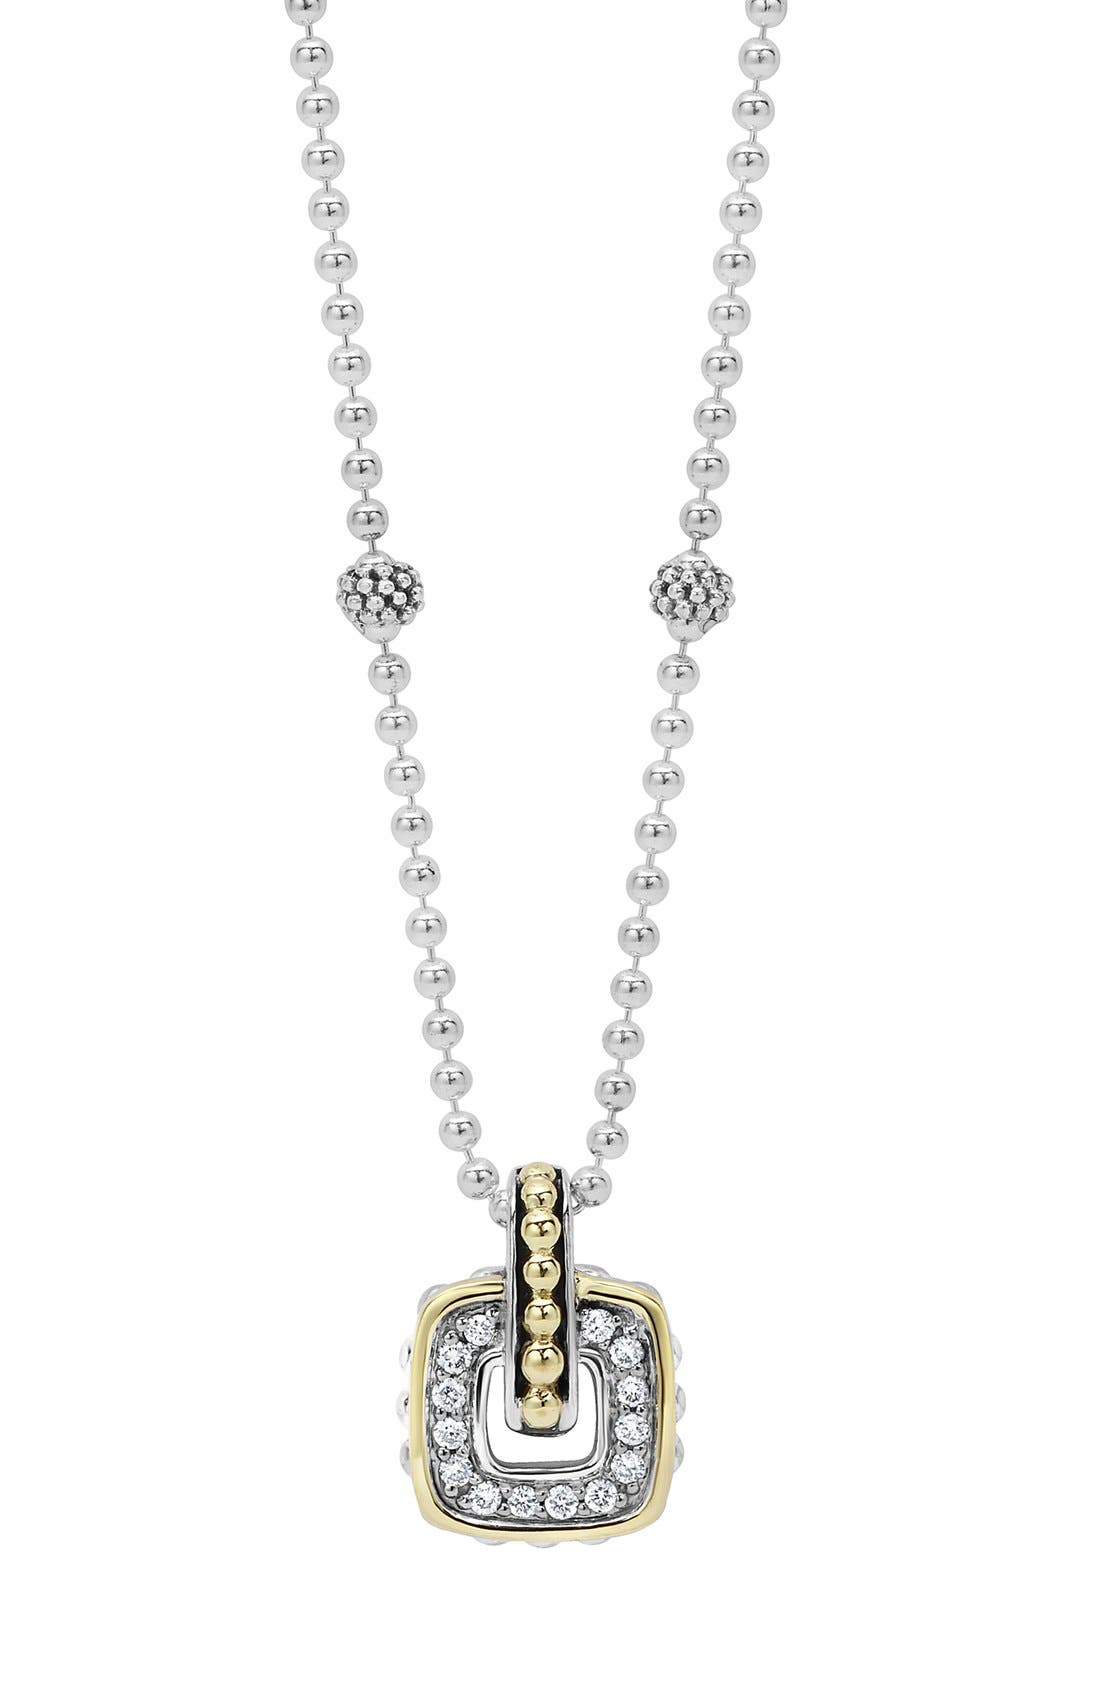 LAGOS 'Cushion' Small Pendant Necklace